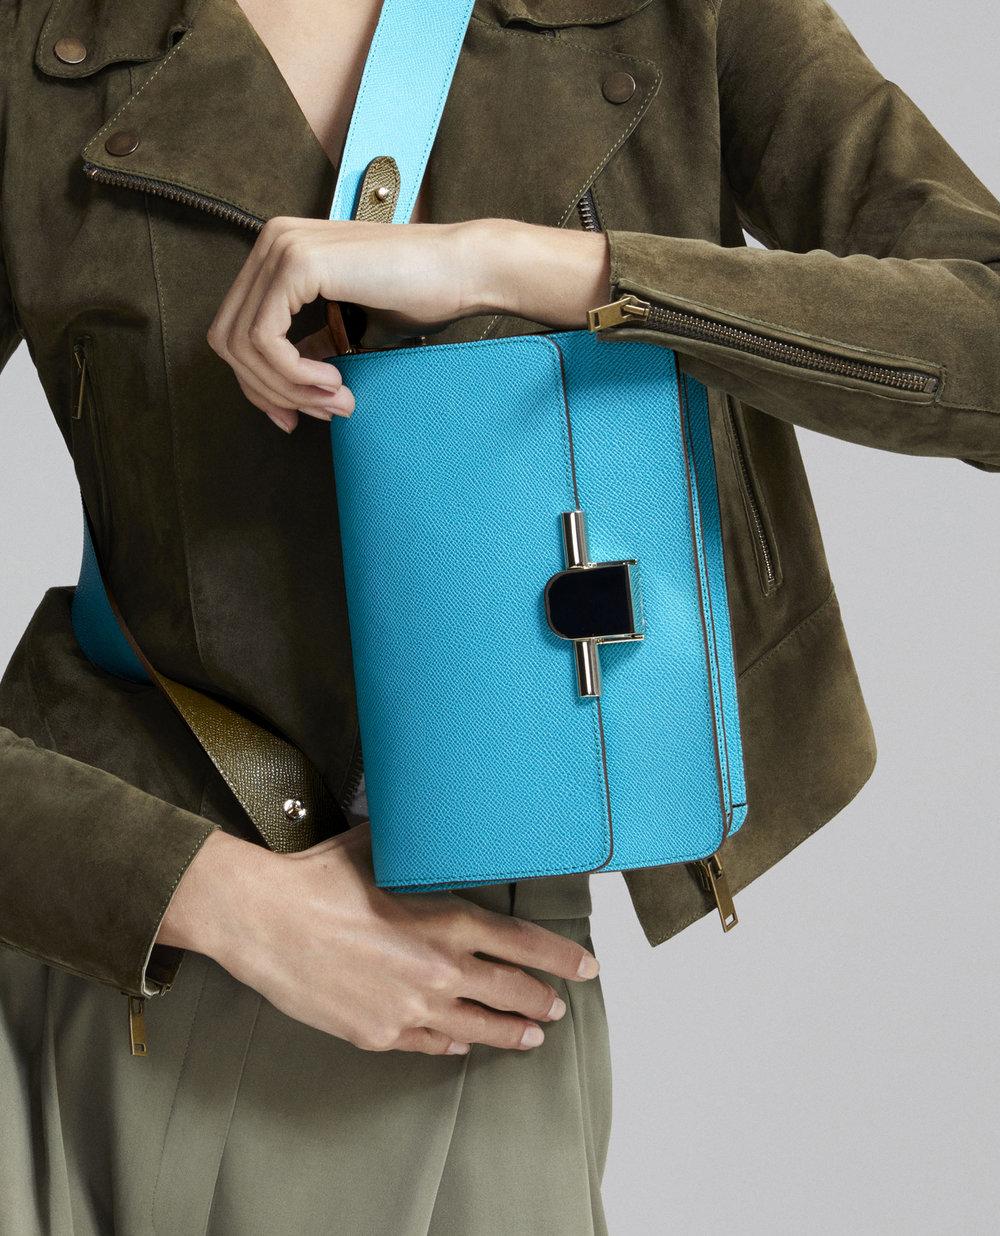 Massimo Dutti_The Iconic Bag (12).jpg